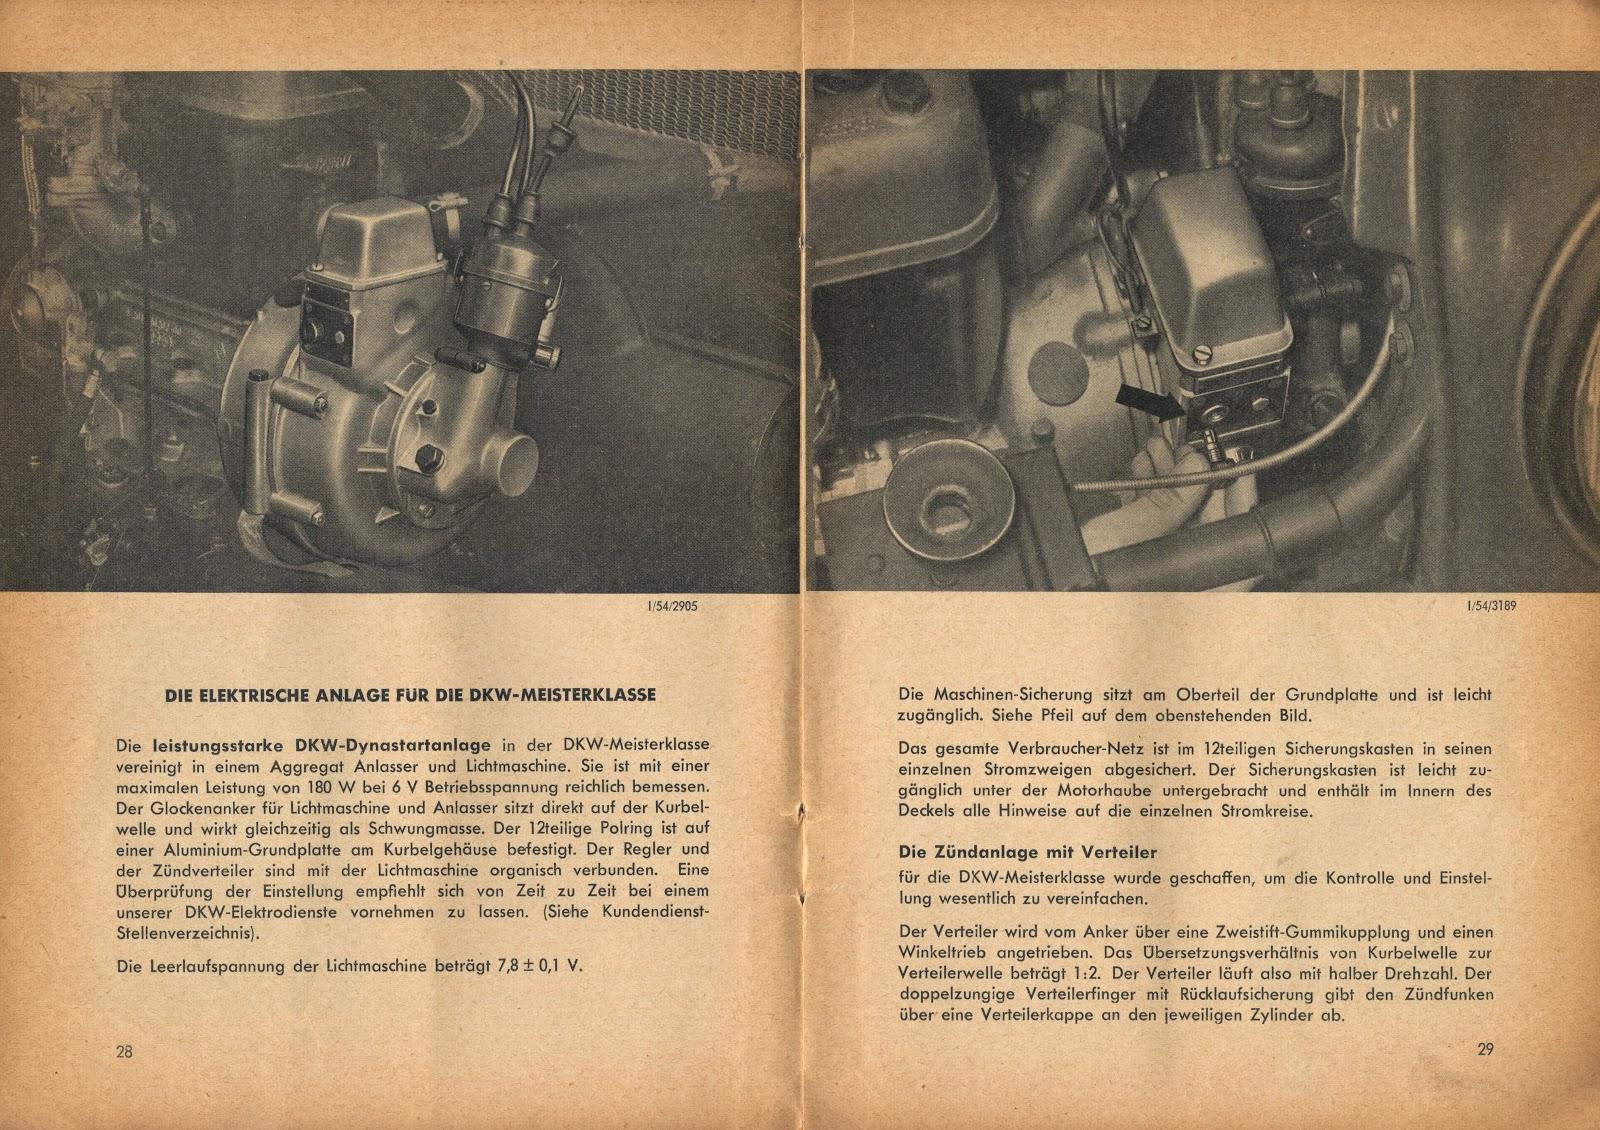 dkw auto union project 1953 dkw f89p meisterklasse german drivers manual. Black Bedroom Furniture Sets. Home Design Ideas